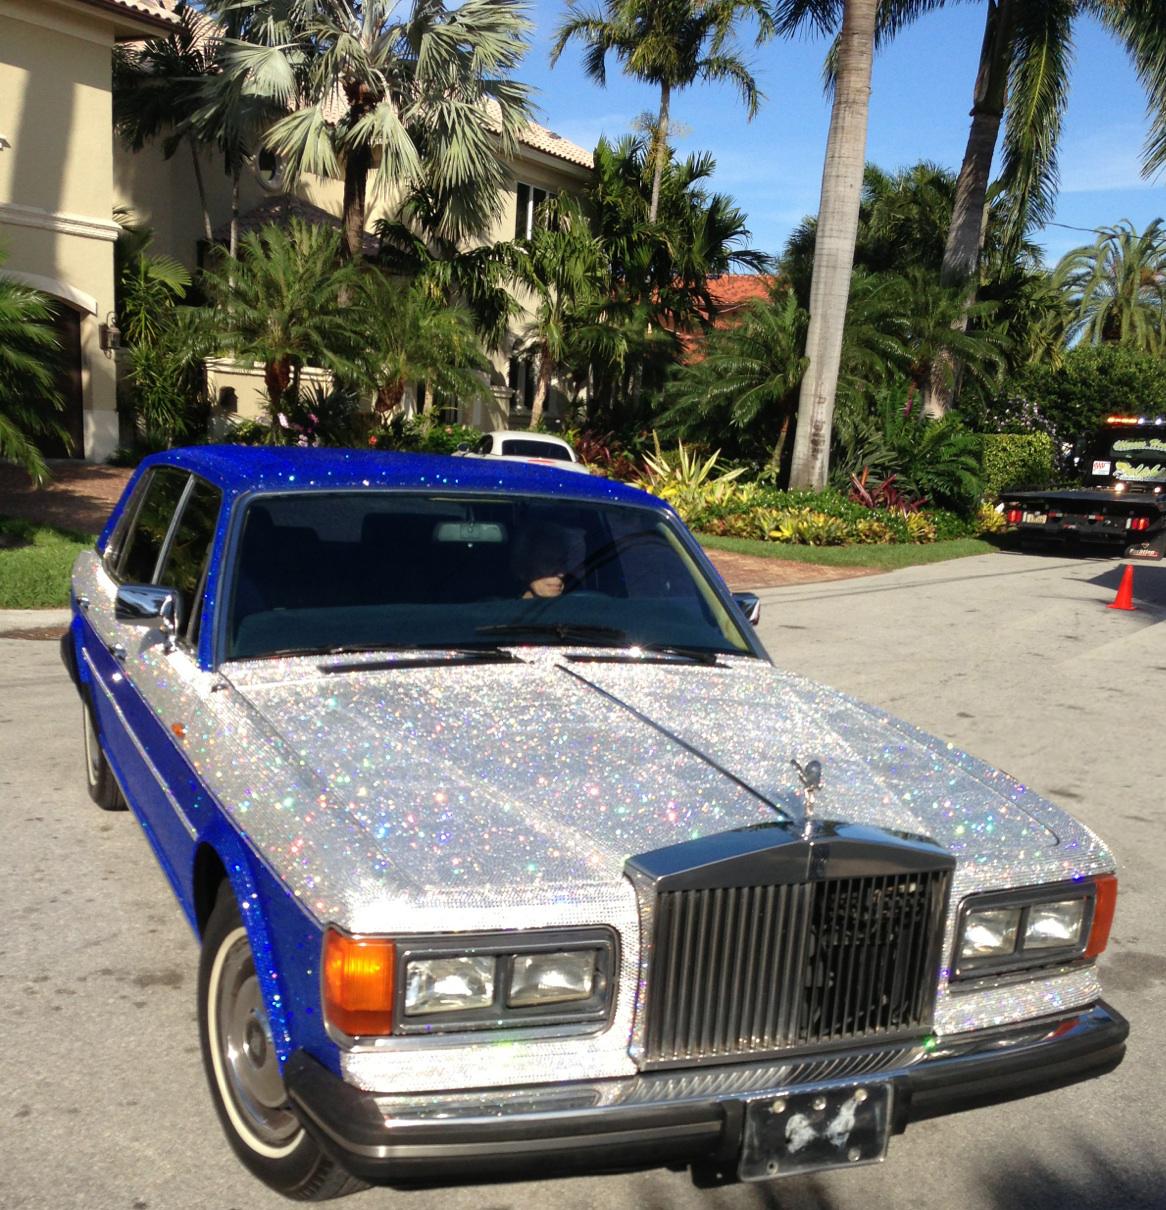 A New Level Of Luxury: Diamond Club Miami Encrusts Vintage